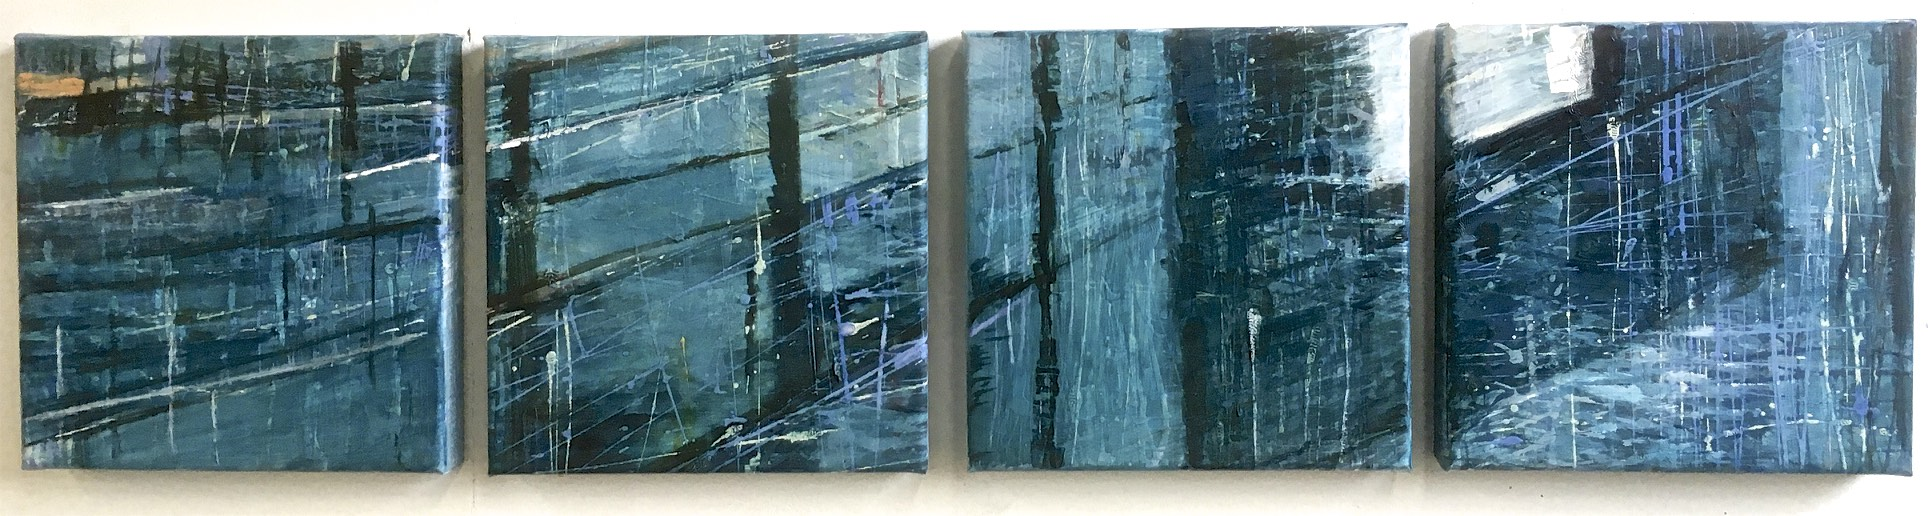 Houthavens 4 | Vierluik | acryl op doek | 30 x 120 cm